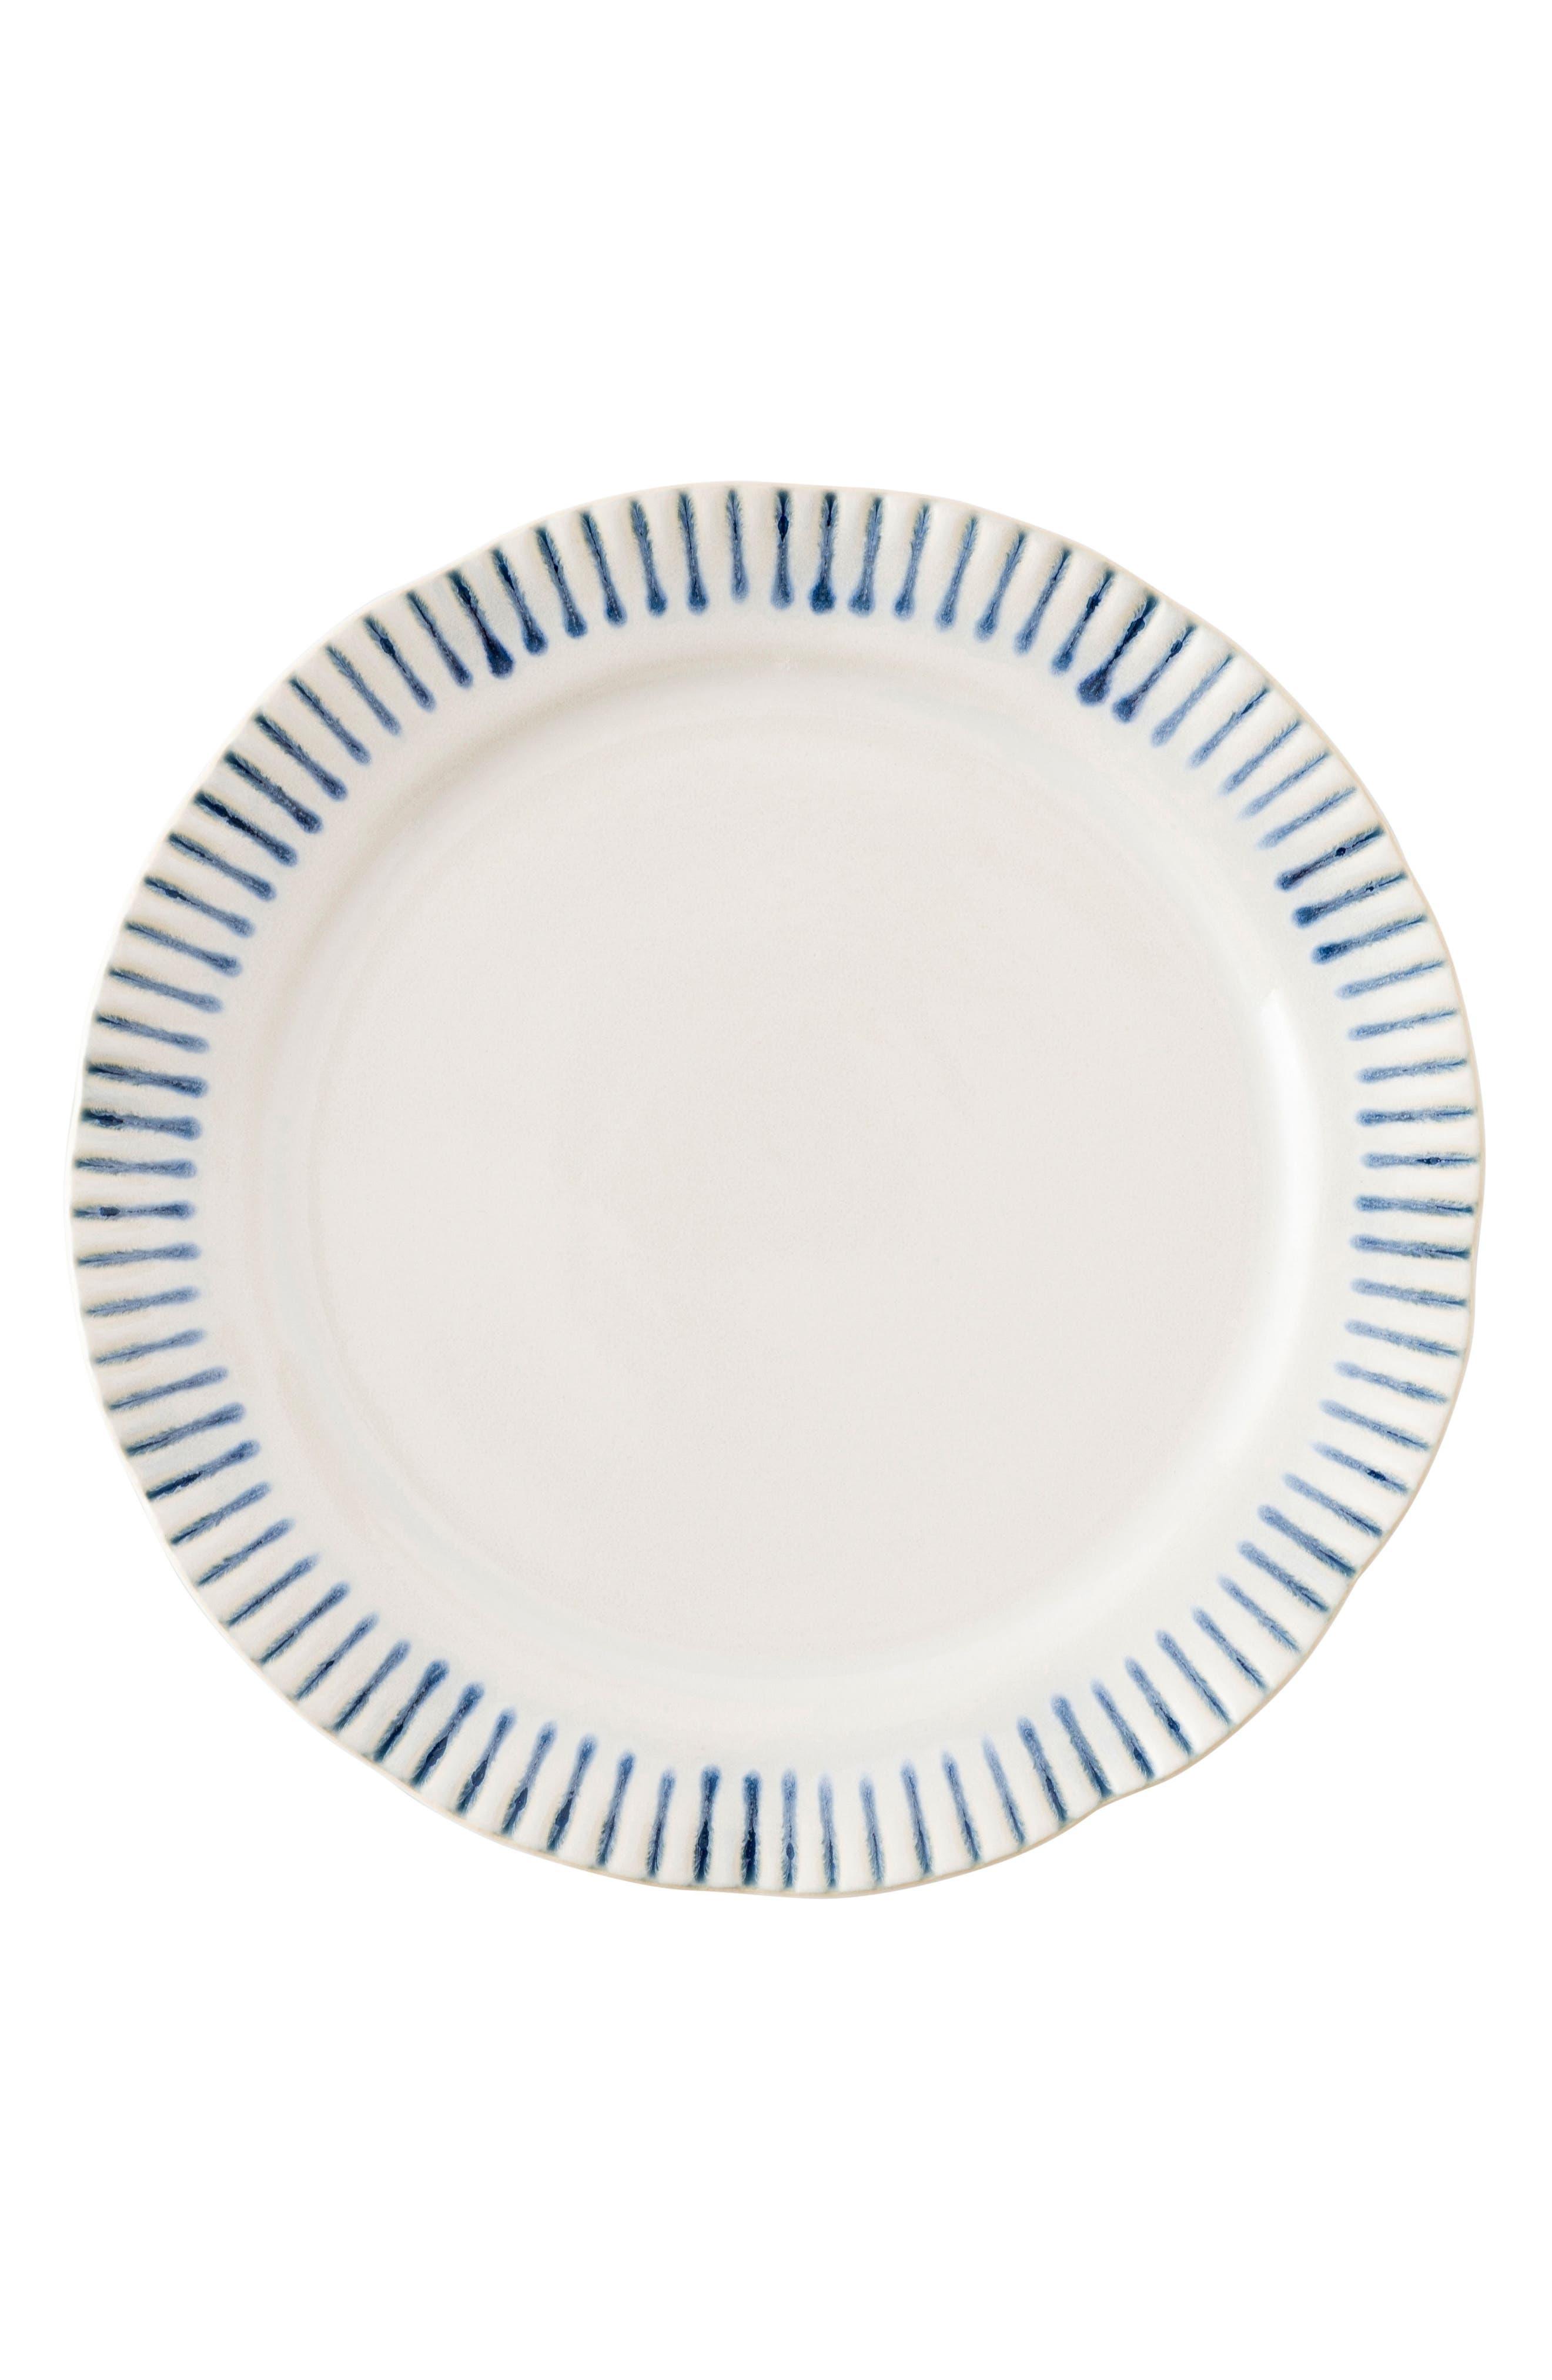 Sitio Stripe Stoneware Salad Plate,                             Main thumbnail 1, color,                             Indigo